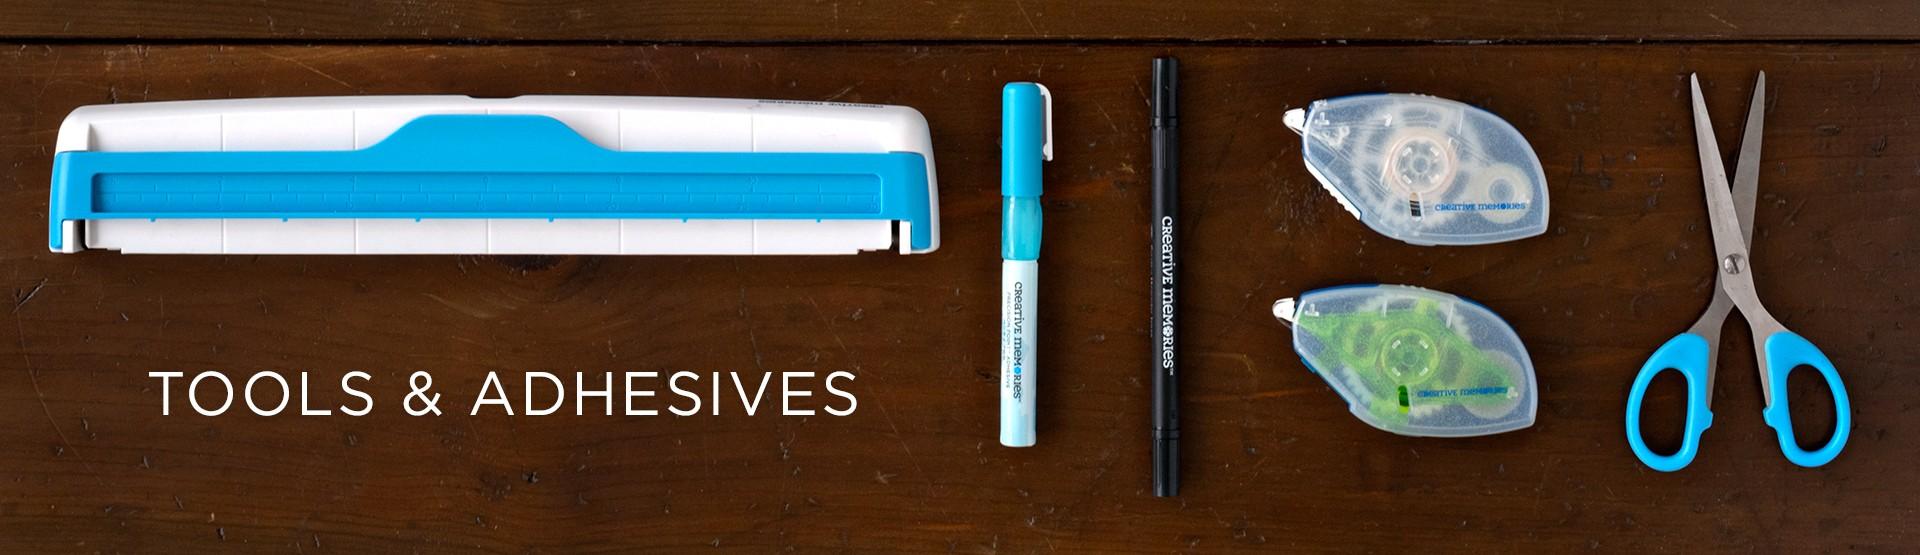 Tools, Adhesives, Storage & Pens